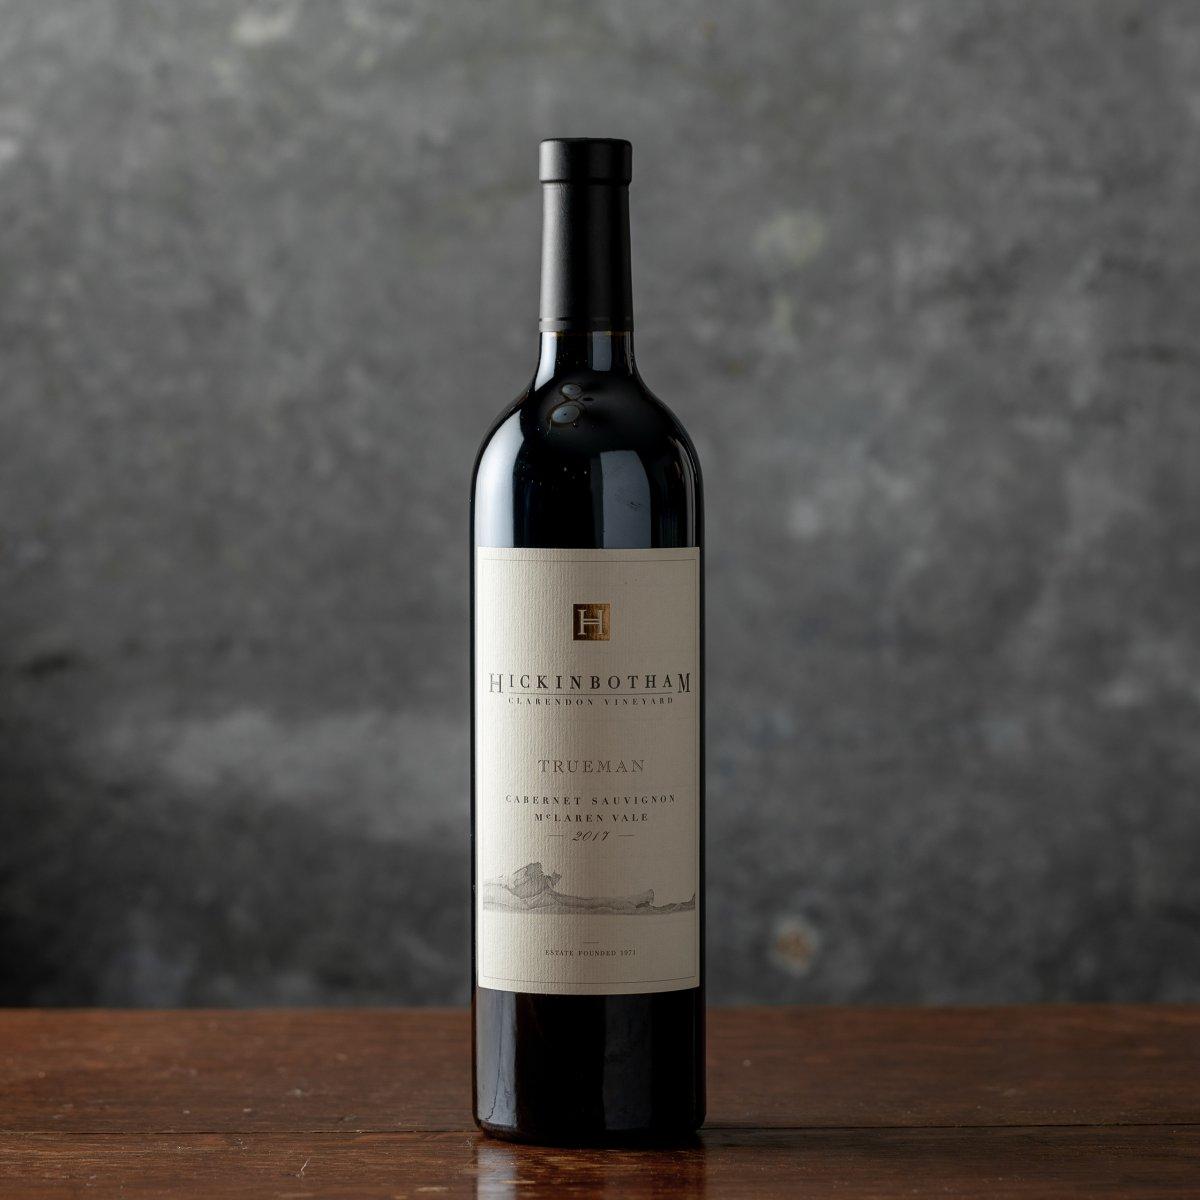 Wine bottle of Trueman Cabernet Sauvginon against a gray backdrop